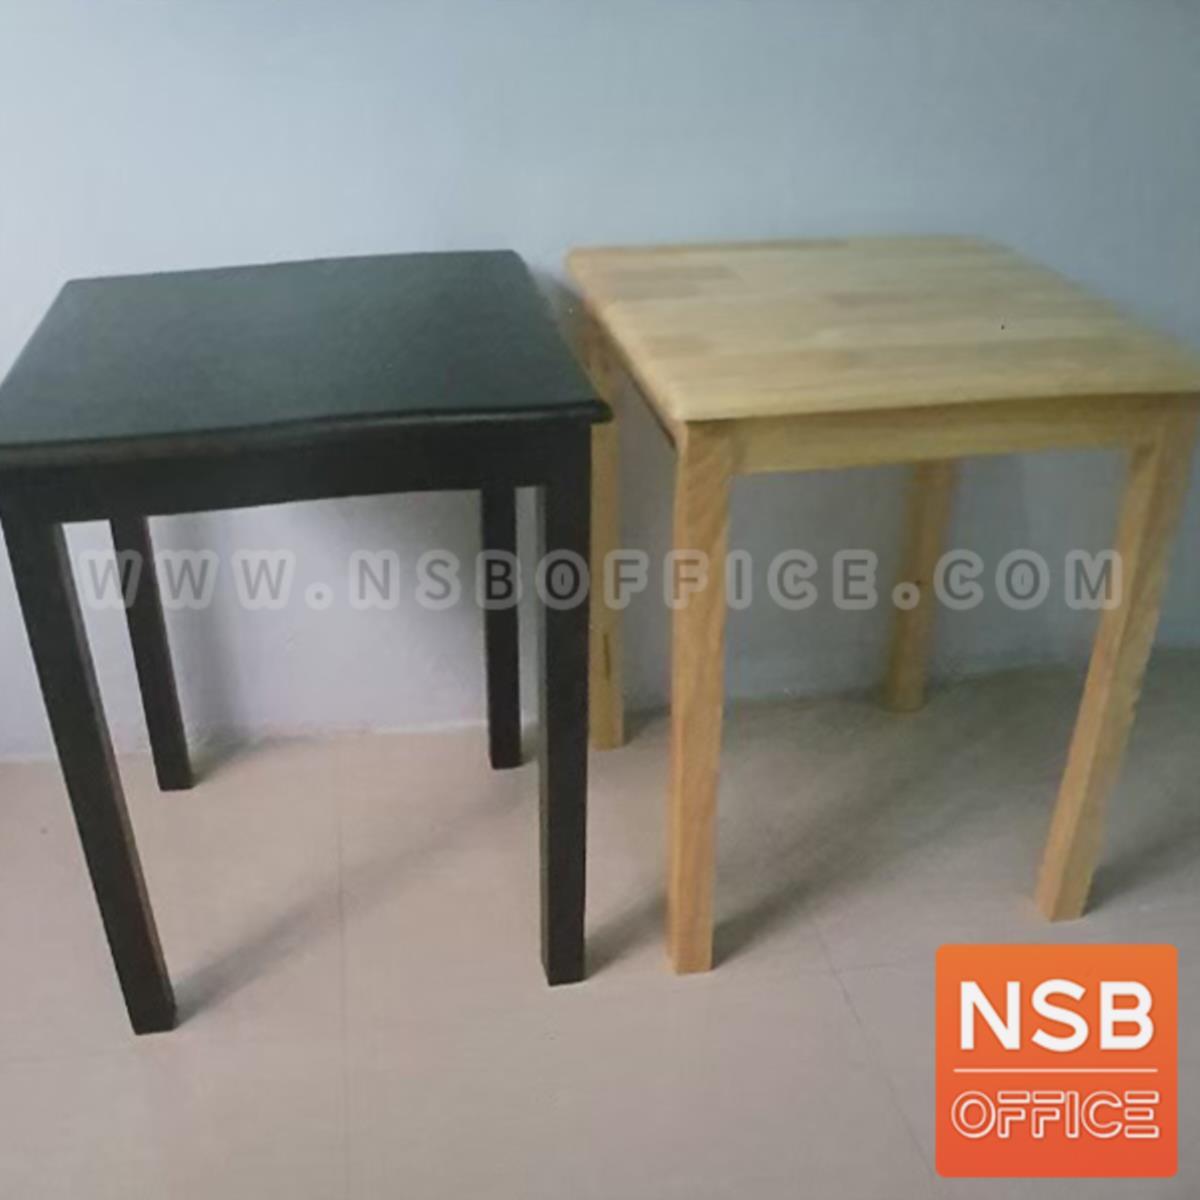 G20A007:โต๊ะอาหารไม้ยางพาราเหลี่ยม รุ่น  Bella (เบลล่า) ขนาด 60Di cm.